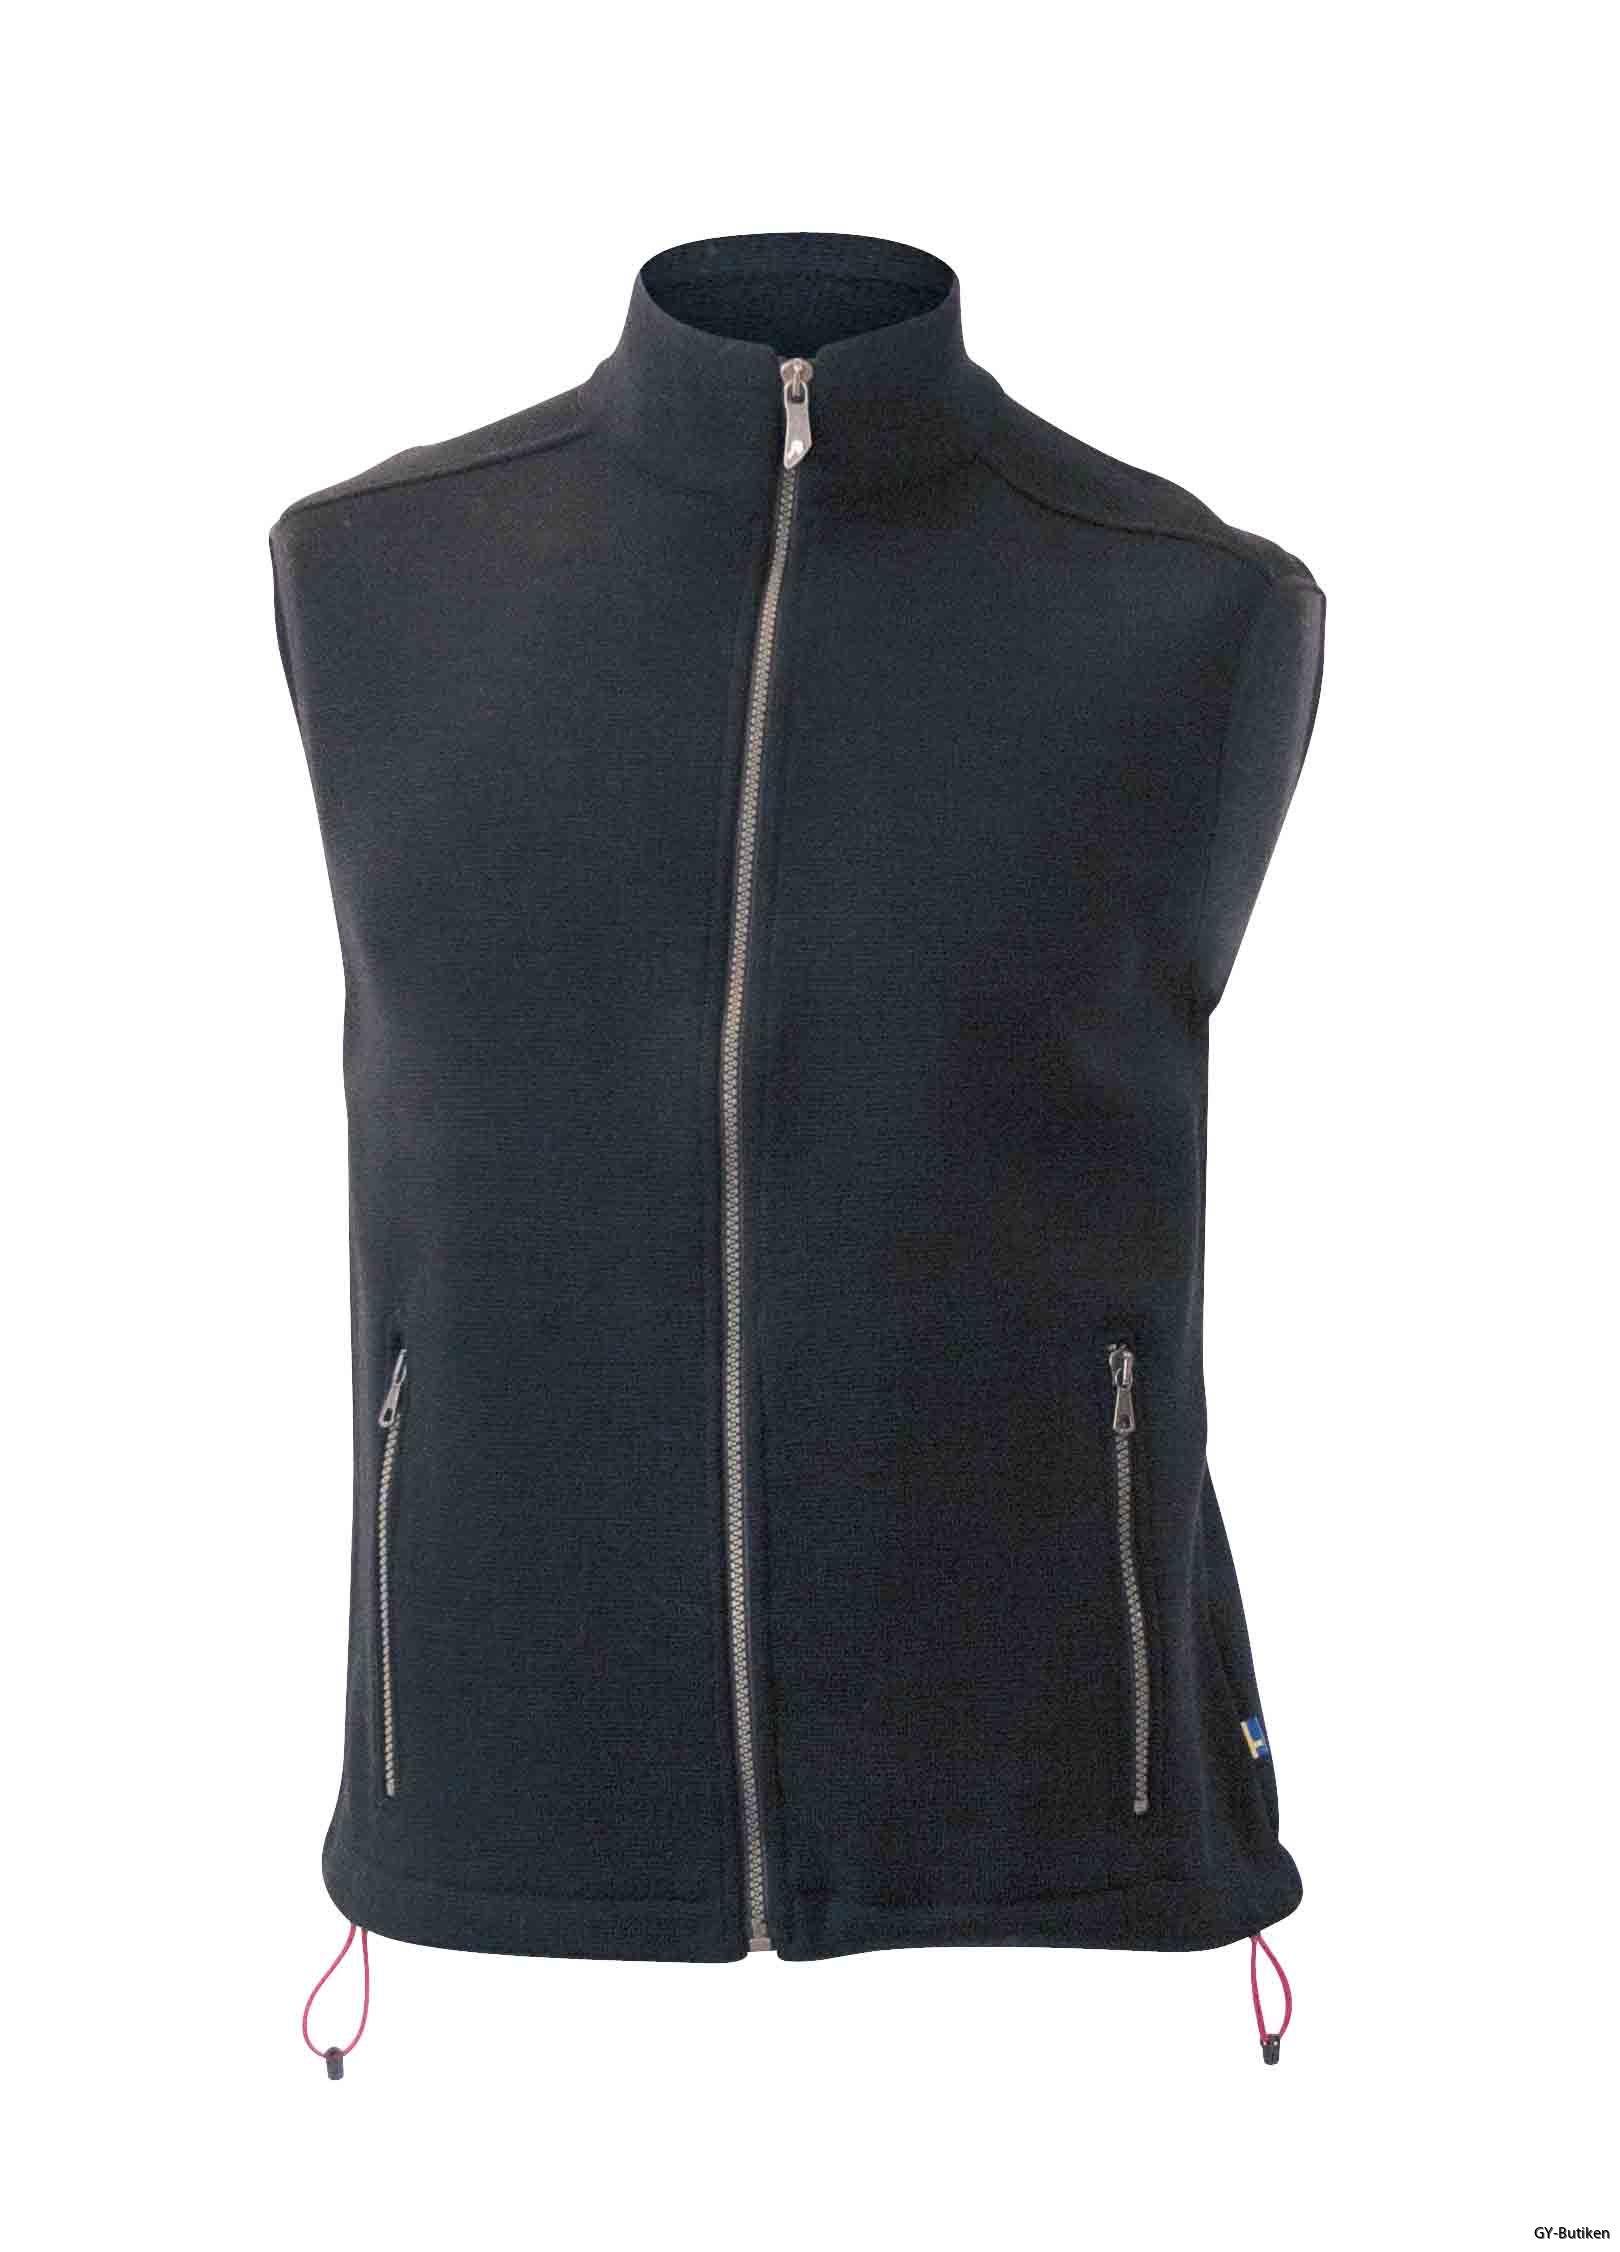 Assar_vest black